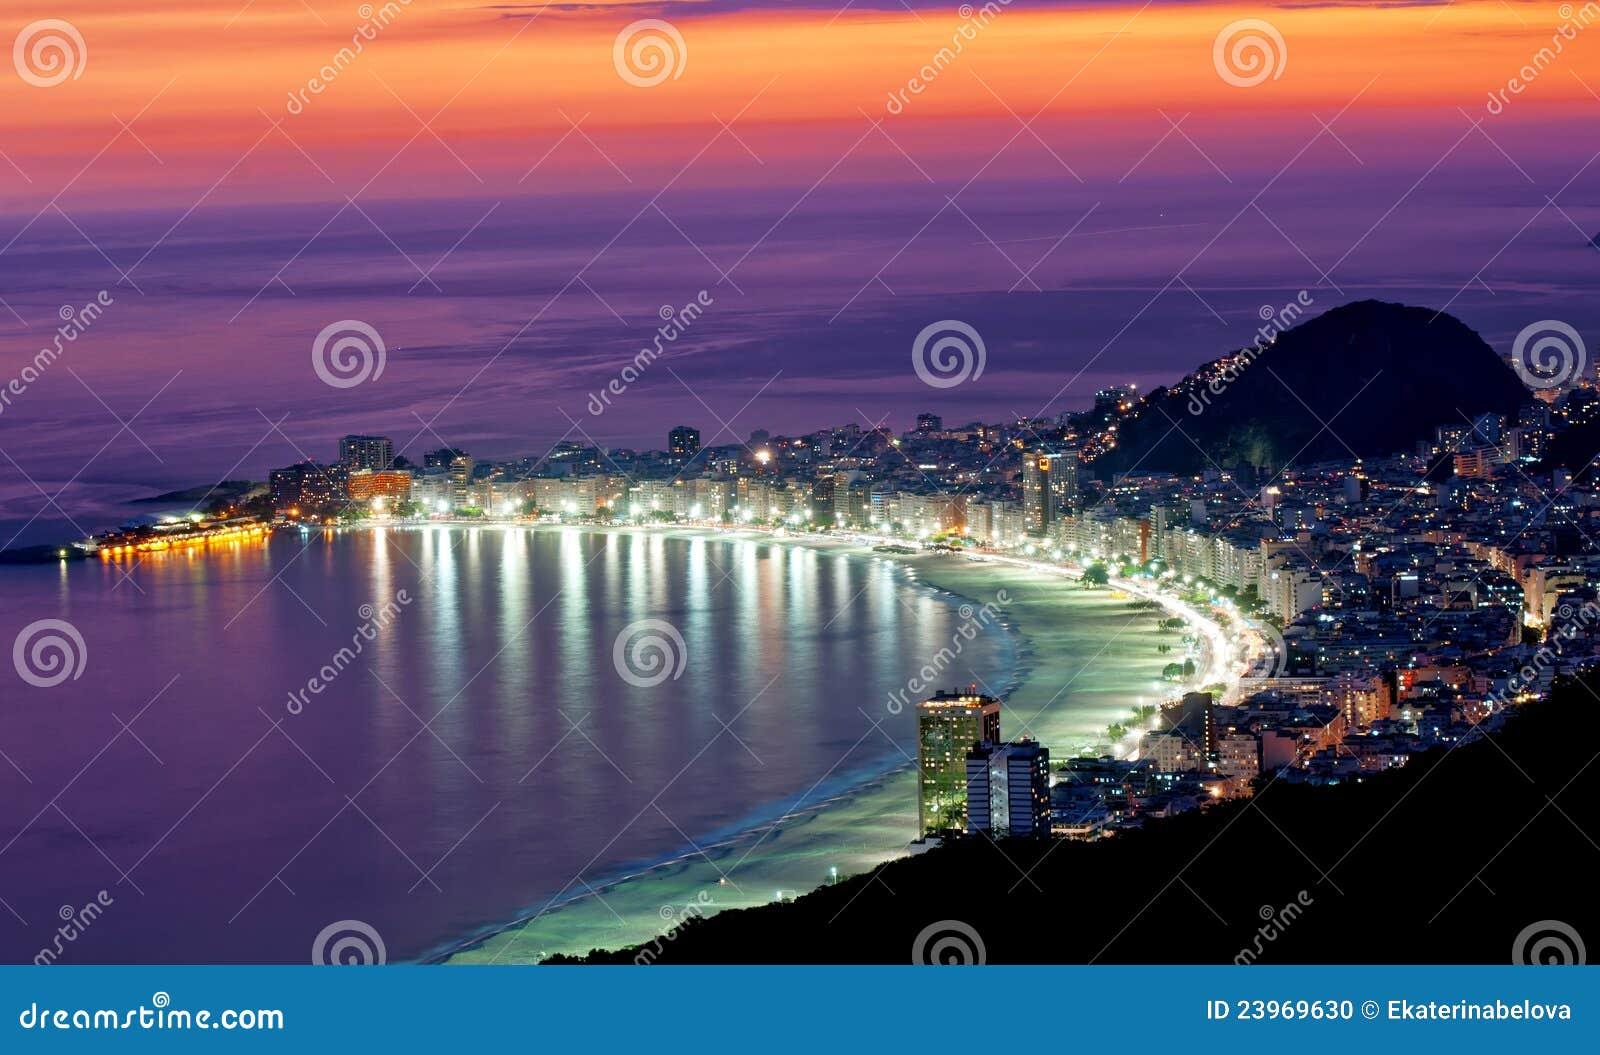 Playa de Copacabana. Rio de Janeiro